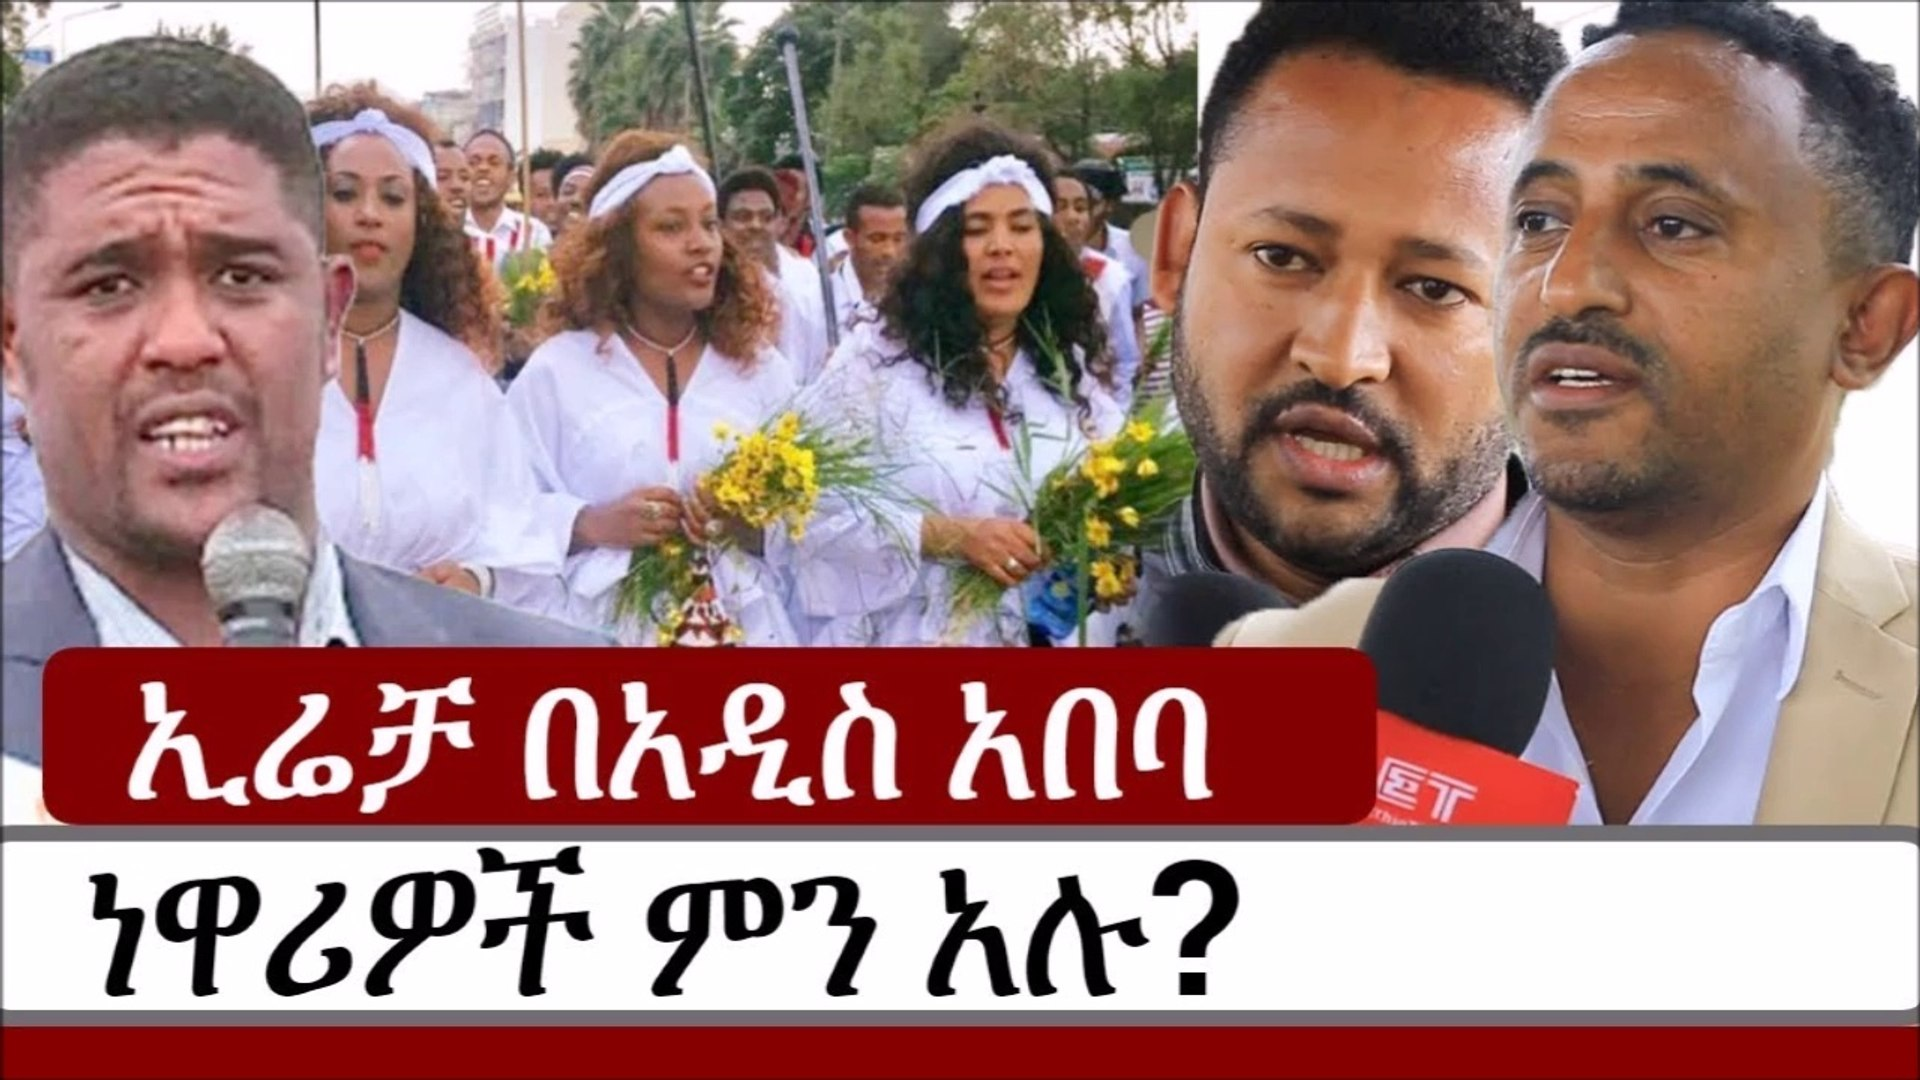 Ethiopia ኢሬቻ በአዲስ አበባ ይከበራል መባሉን በተመለከተ የአዲስ አበባ ነዋሪዎች አስተያየት  Irreecha  Addis Ababa